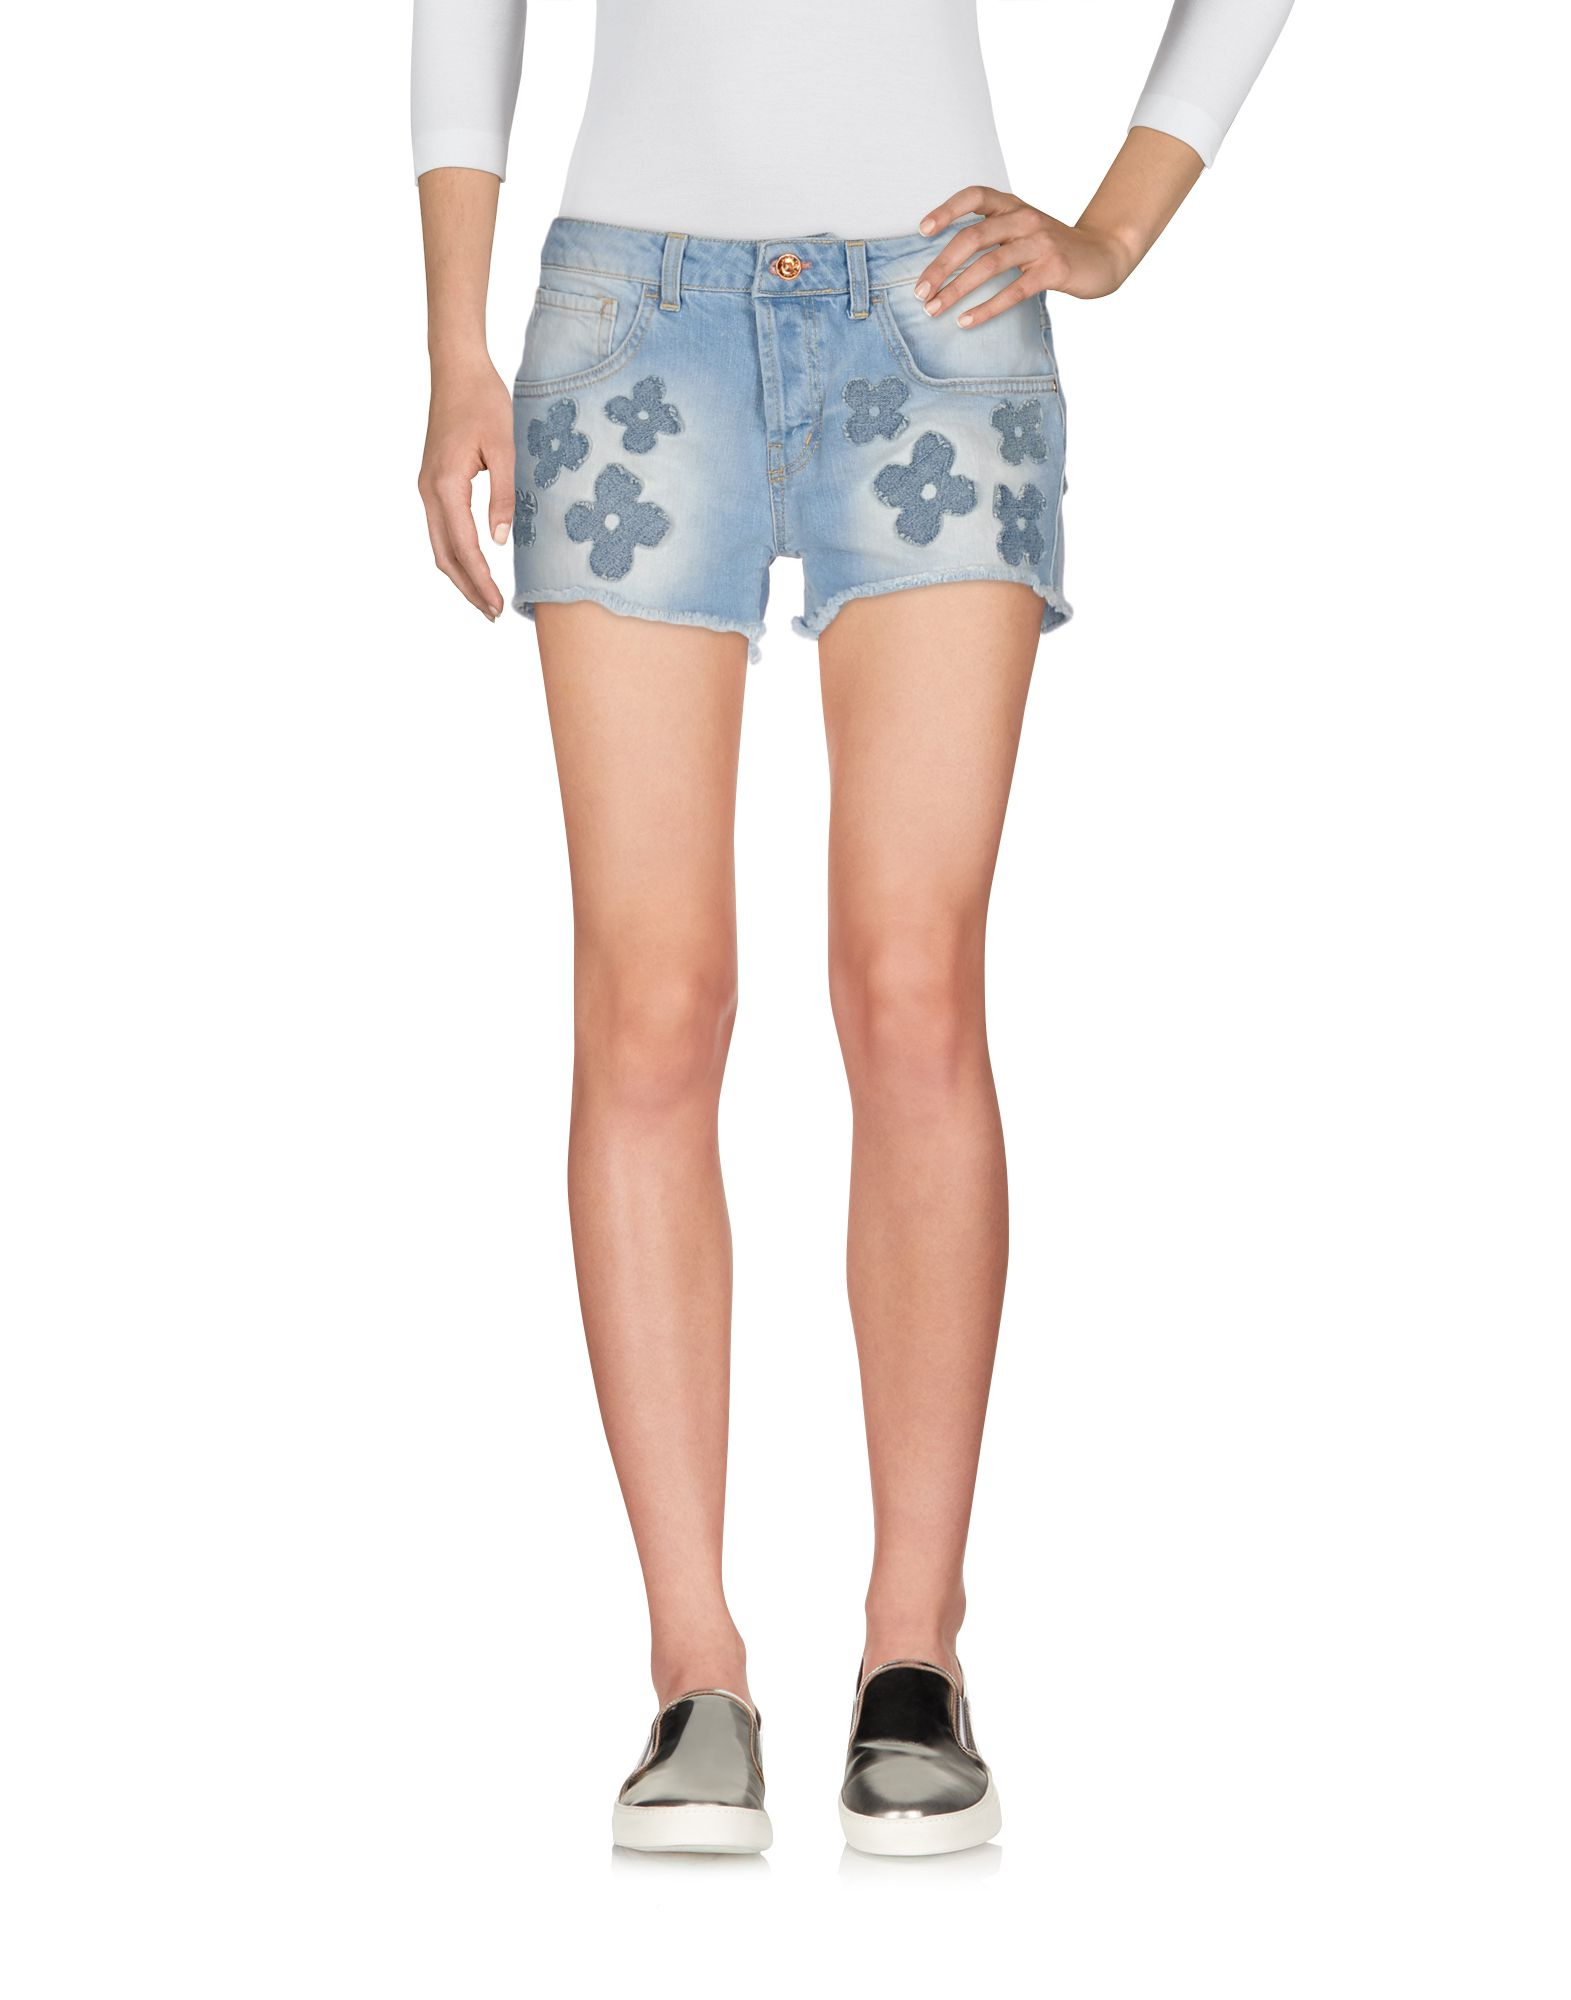 R* JEANS  by RINASCIMENTO Джинсовые шорты r jeans by rinascimento брюки капри